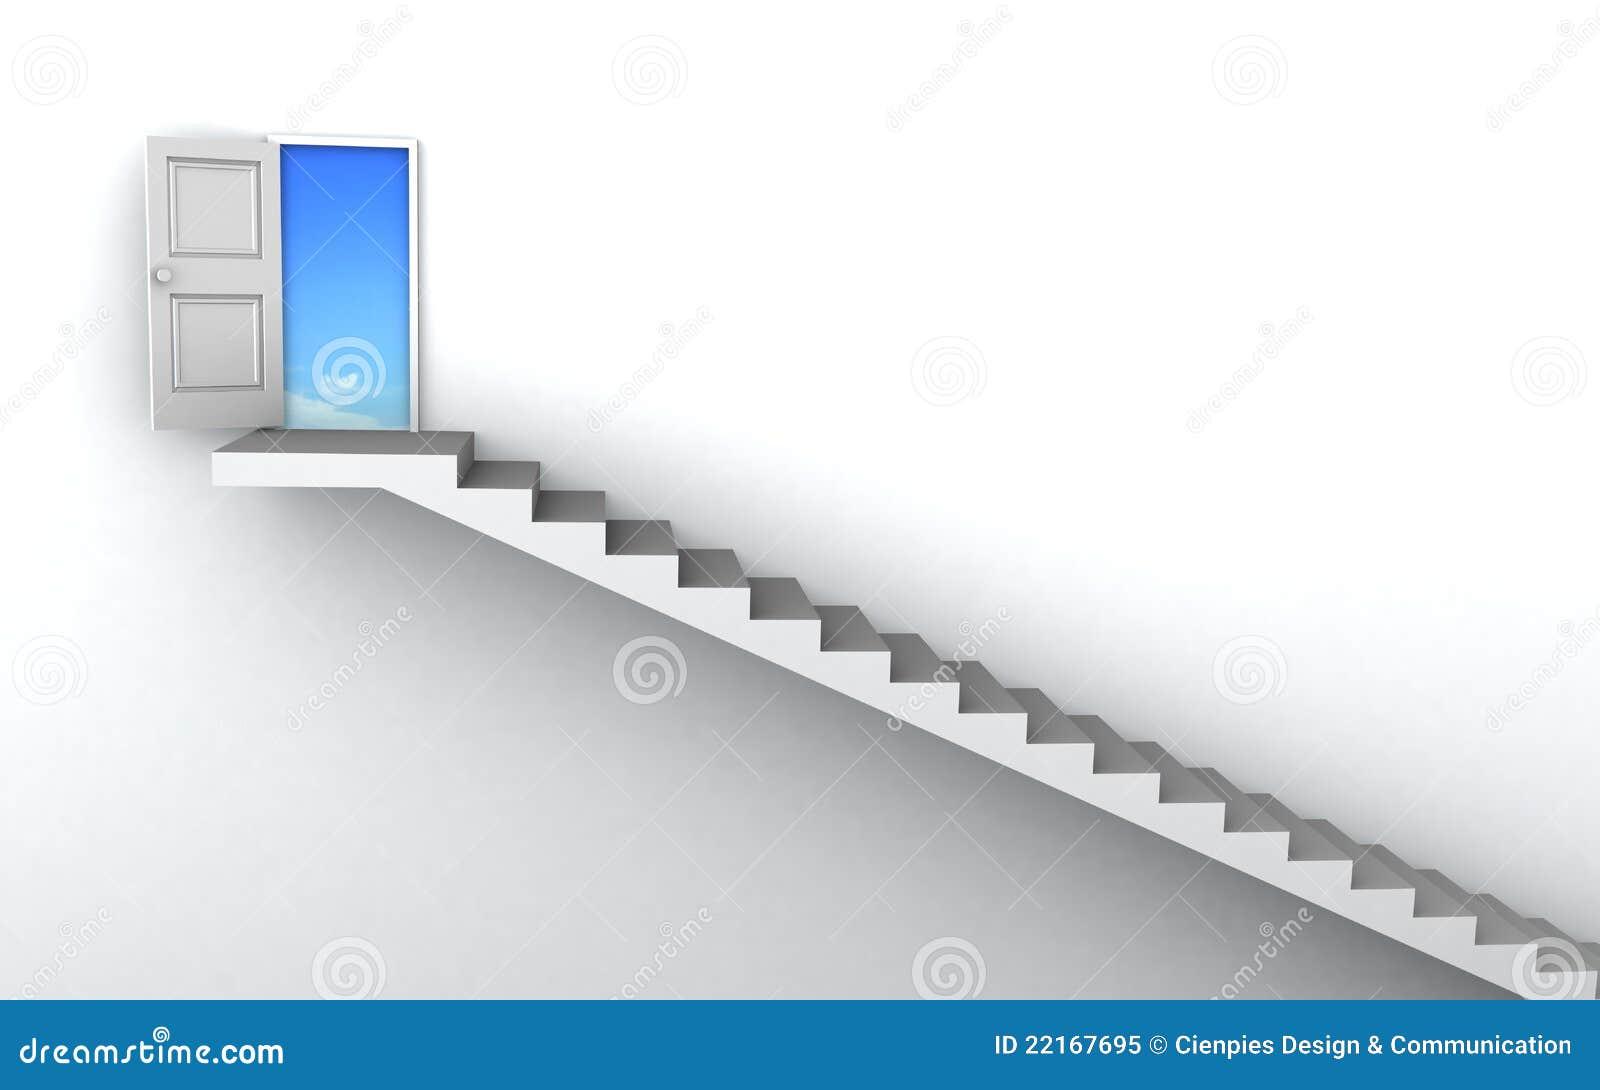 3D Stairs Up To Success Achievement Progress